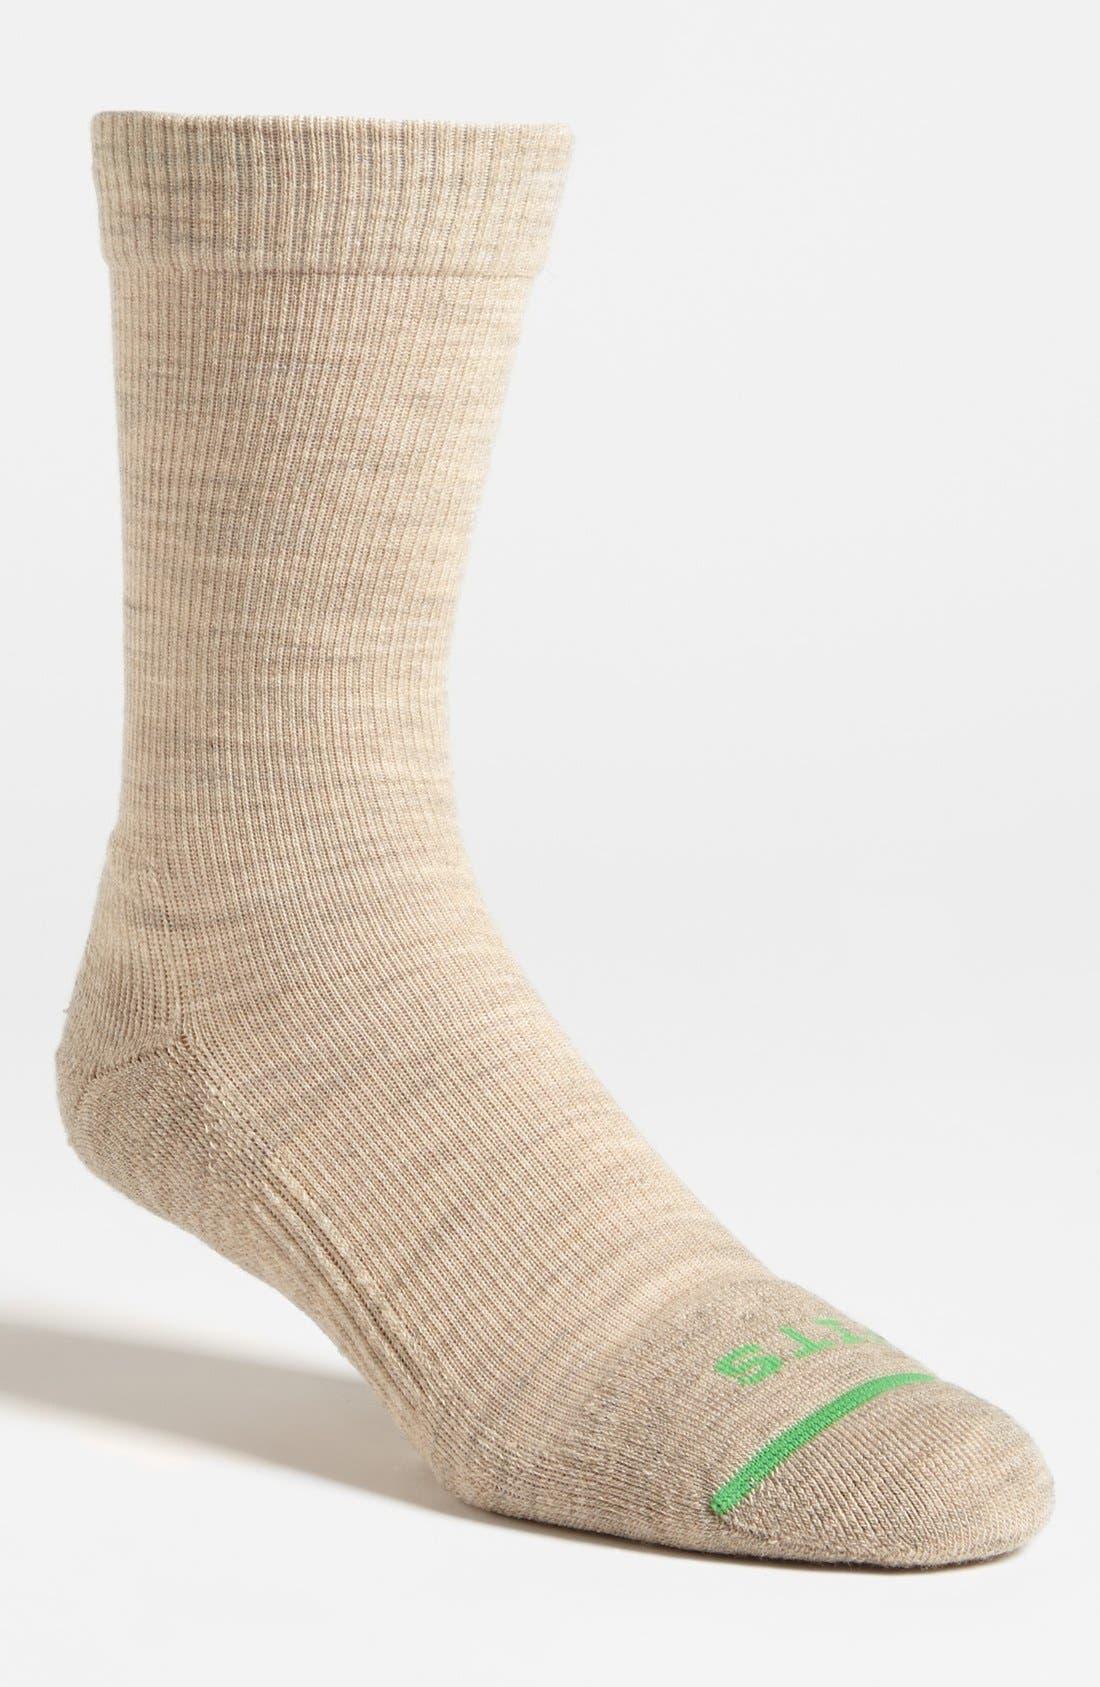 Main Image - FITS Sock Co. Crew Socks